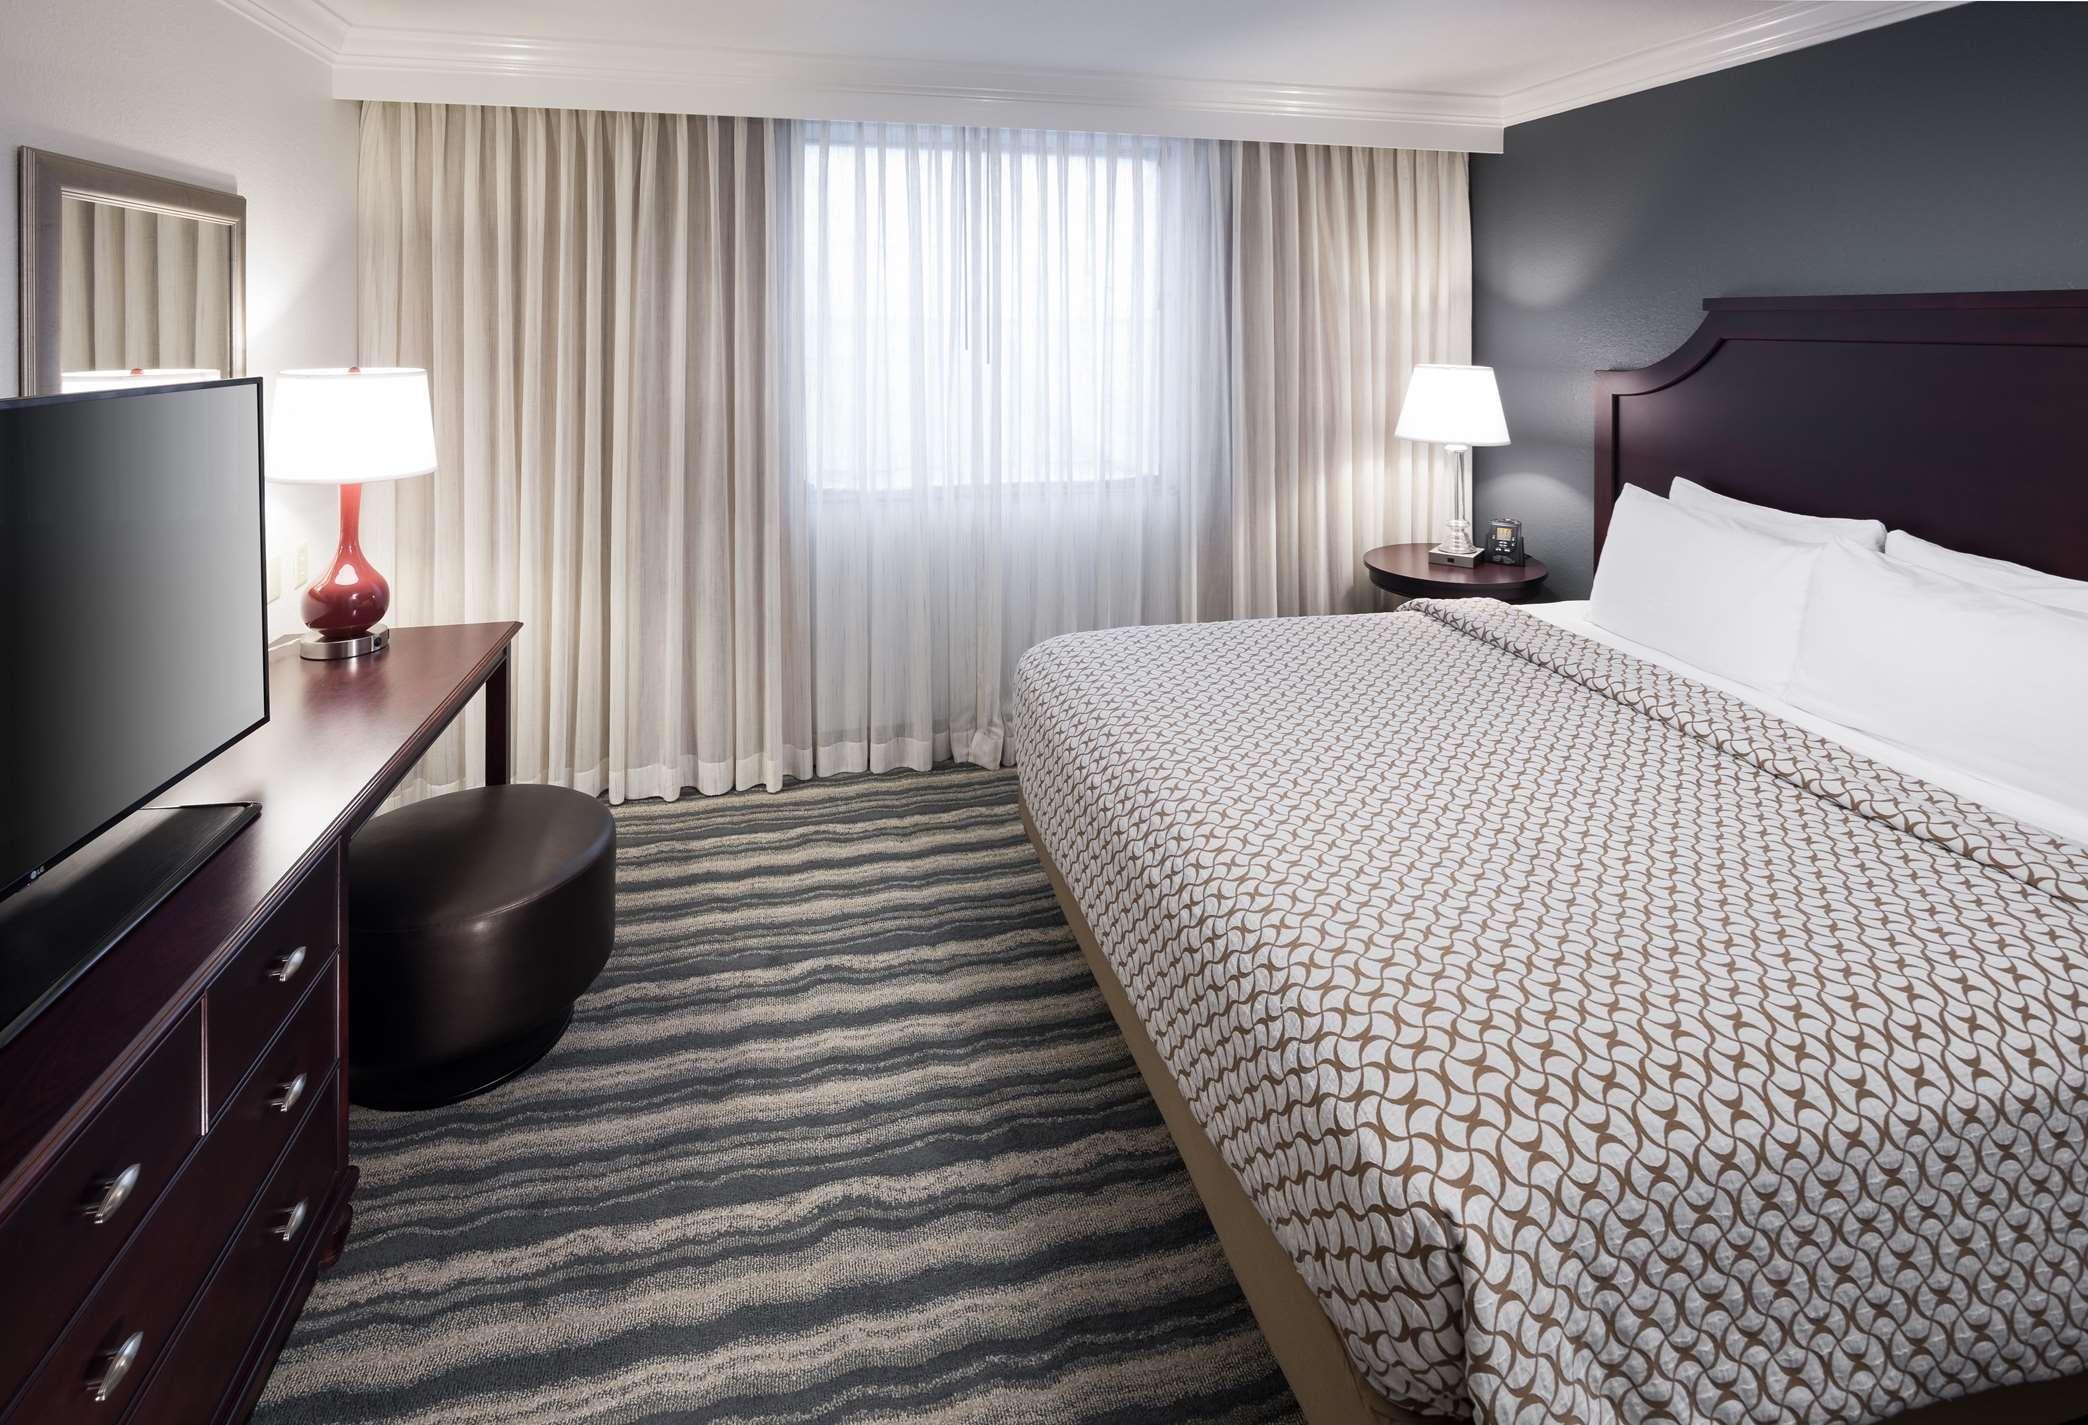 Embassy Suites by Hilton Tampa Brandon image 5